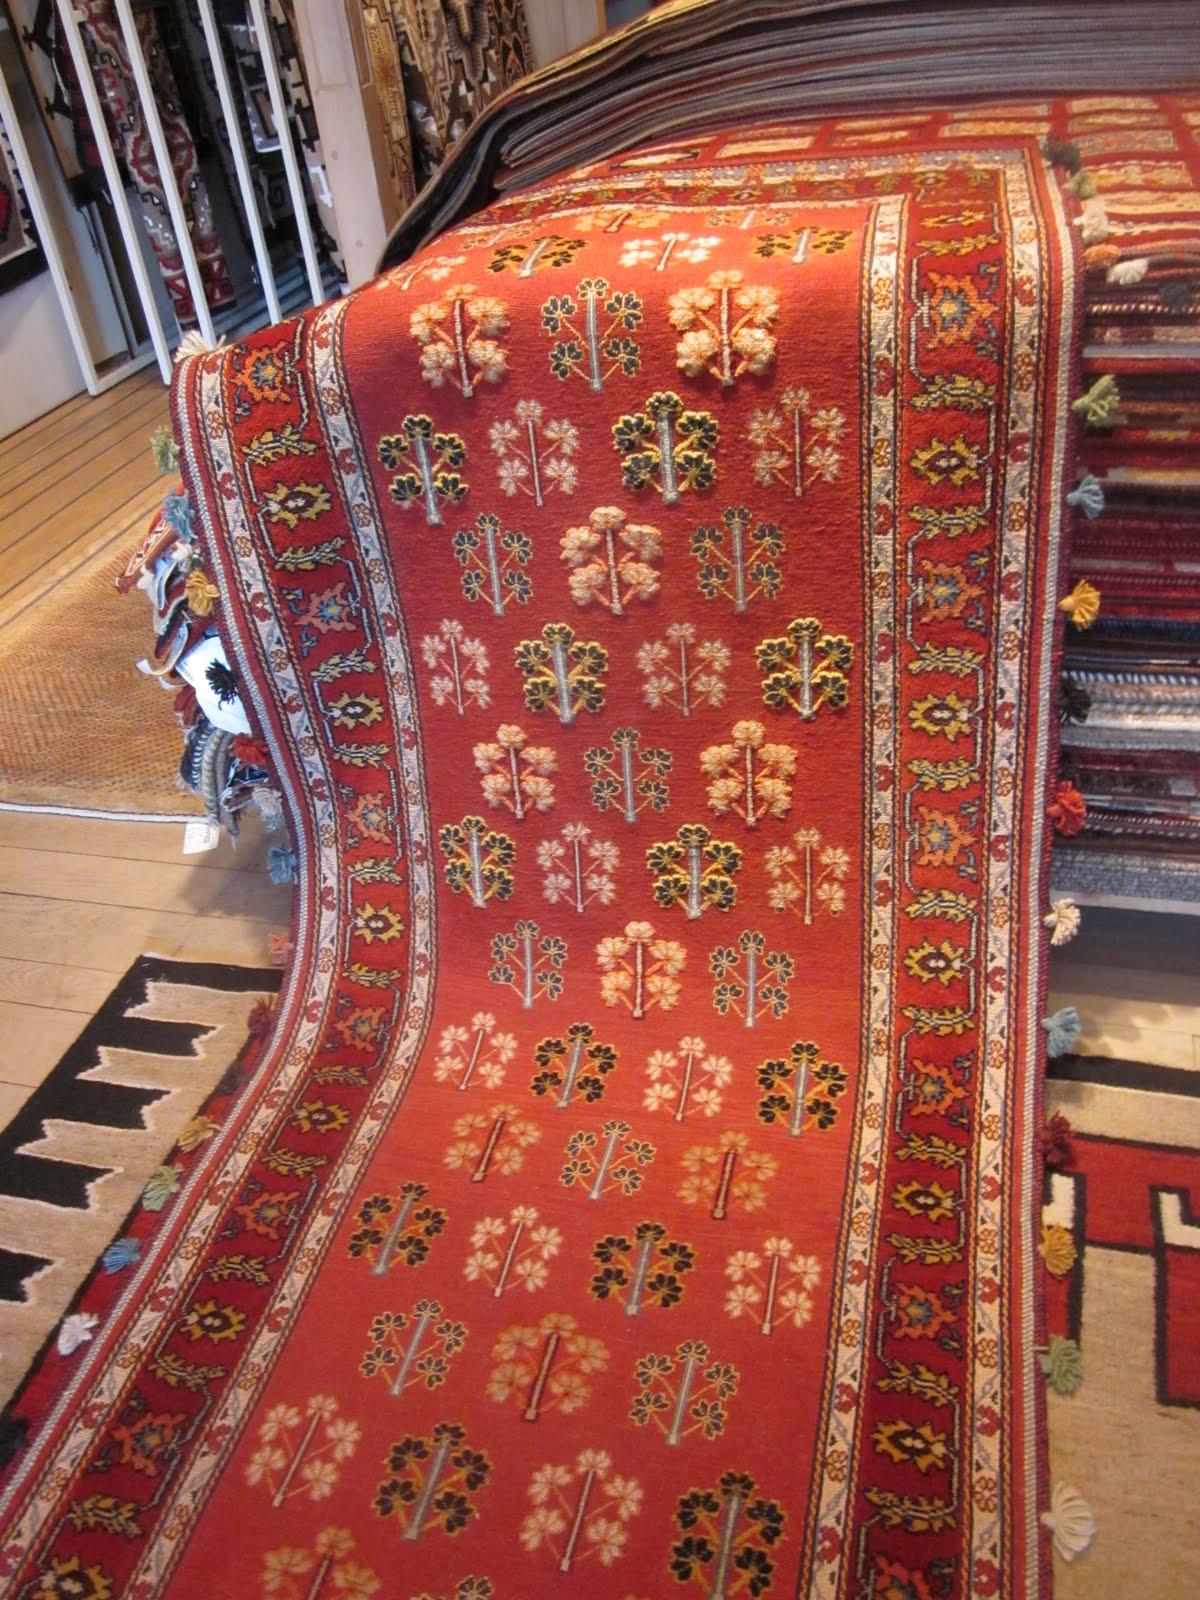 Santa Fe Style Living Room: Victoria At Home: Wishing Wednesday Santa Fe Style